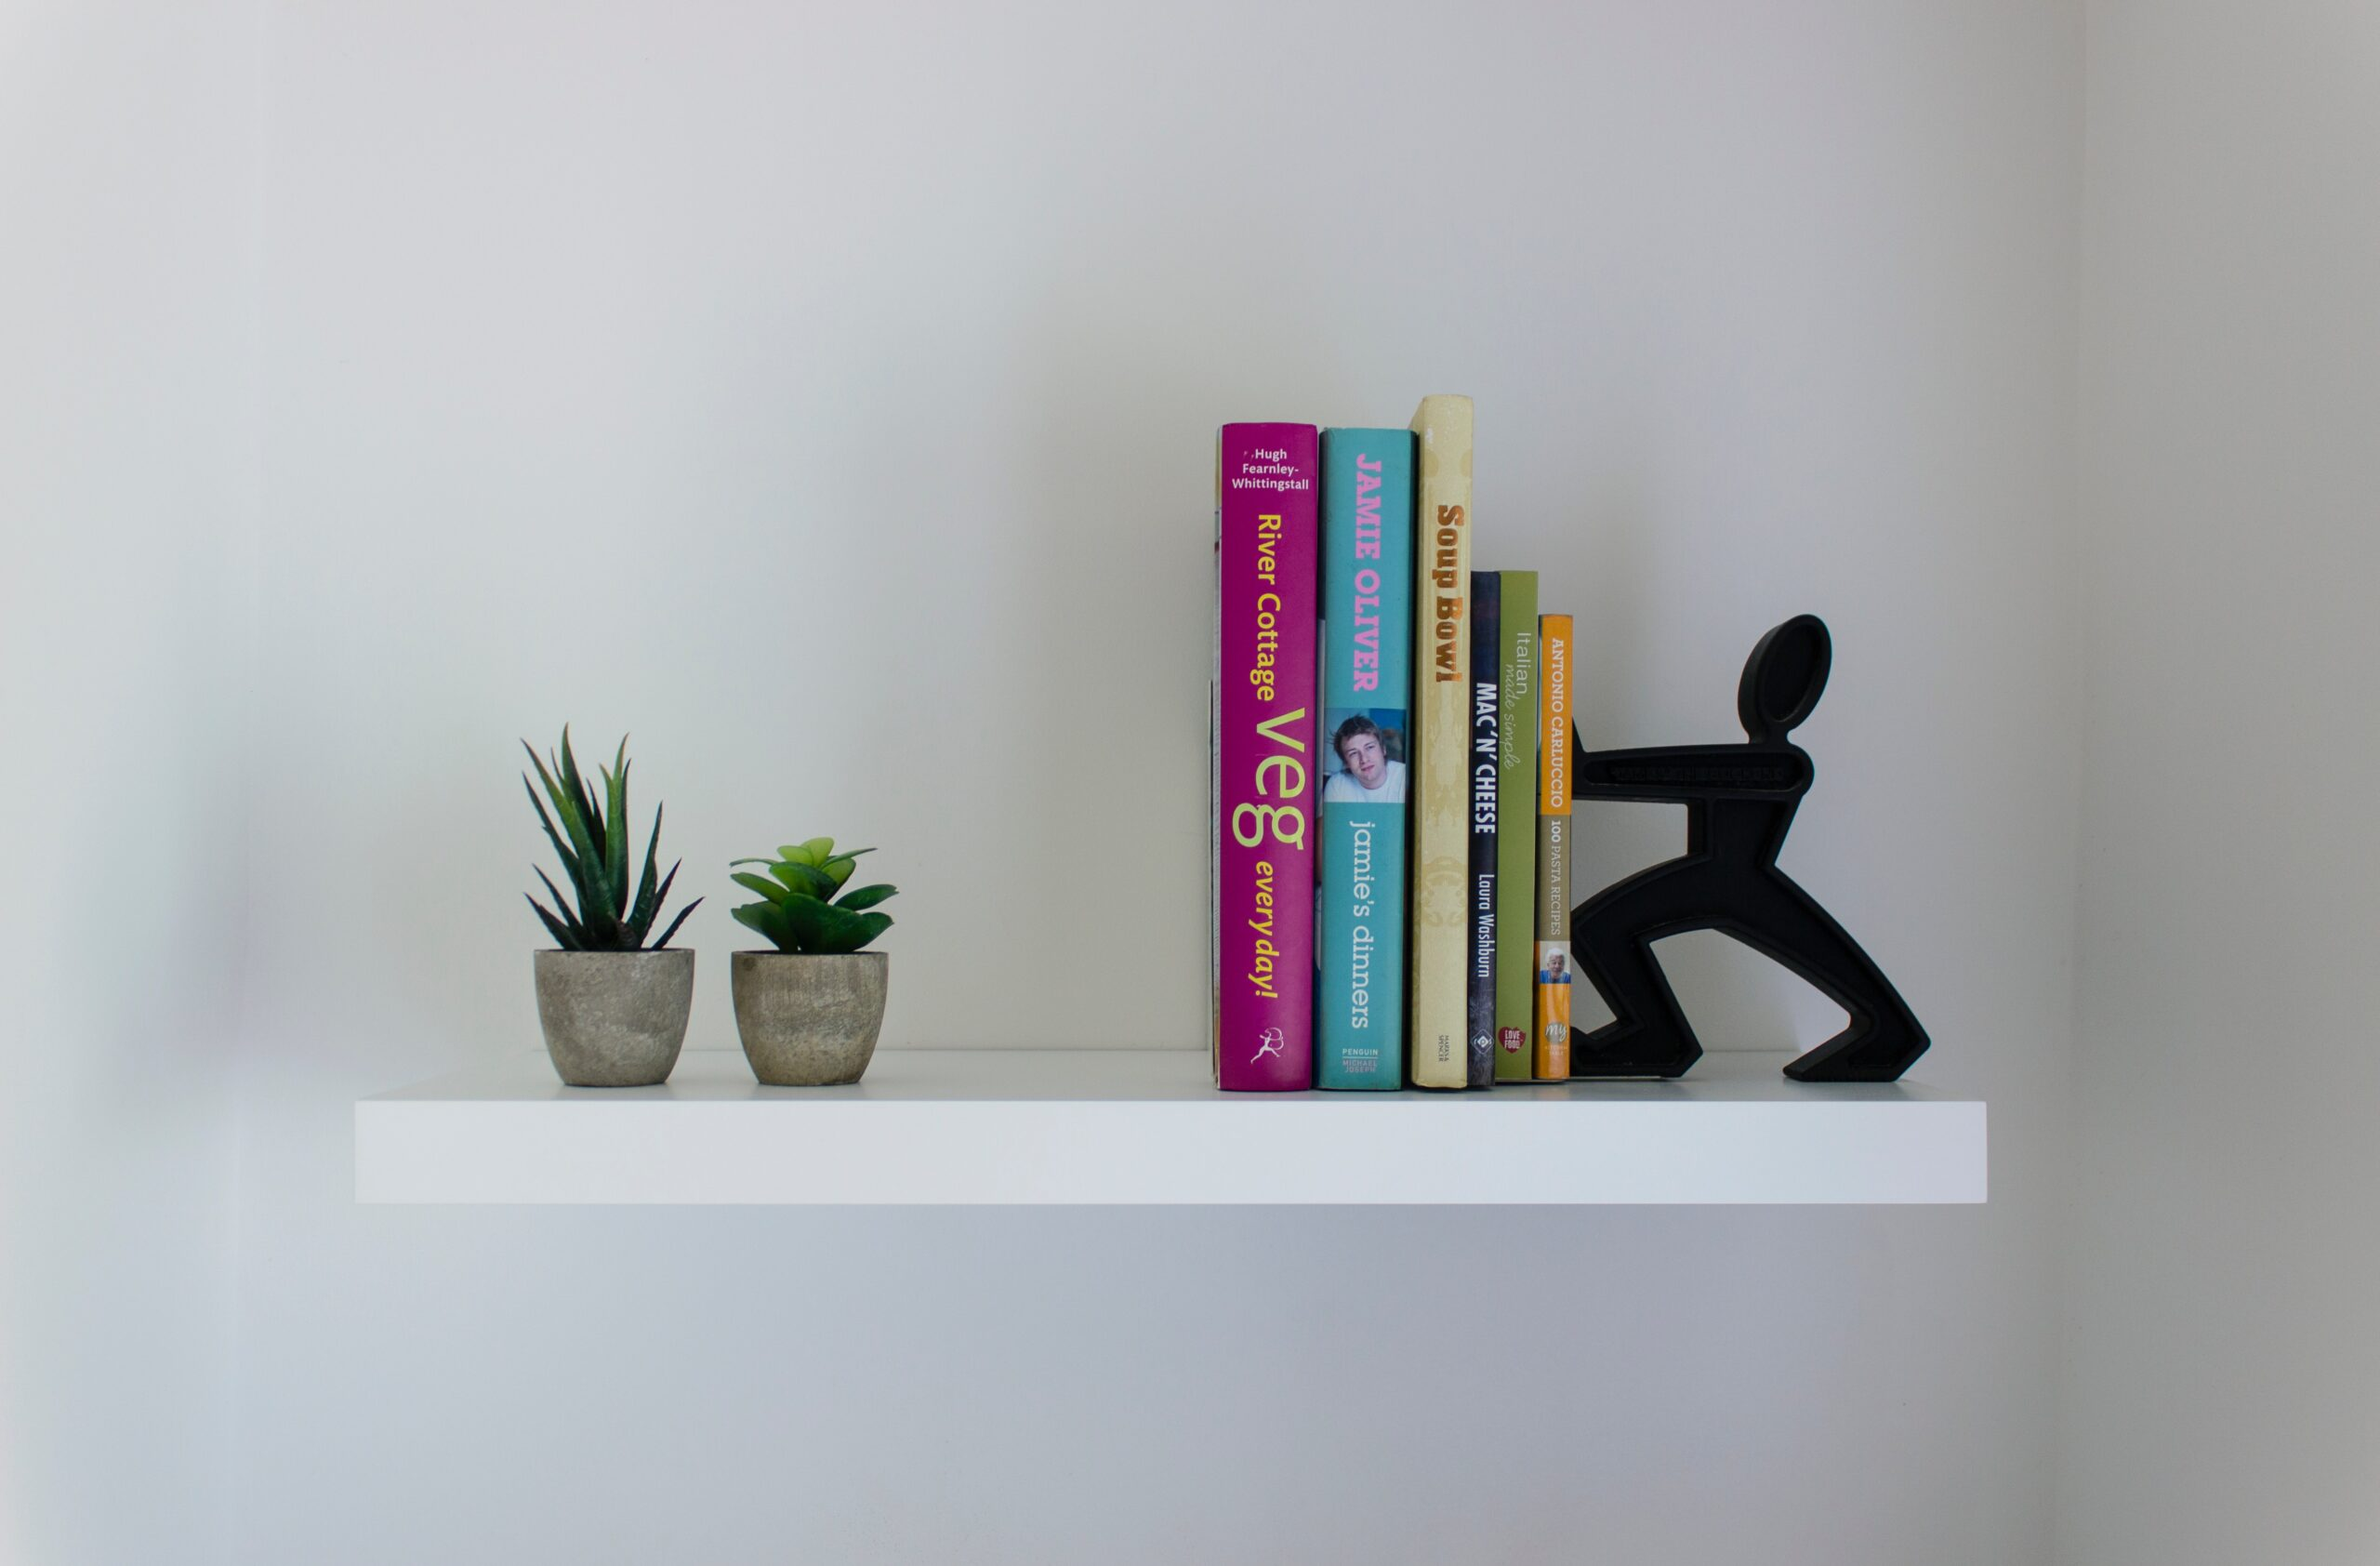 Arrange books on a bookshelf